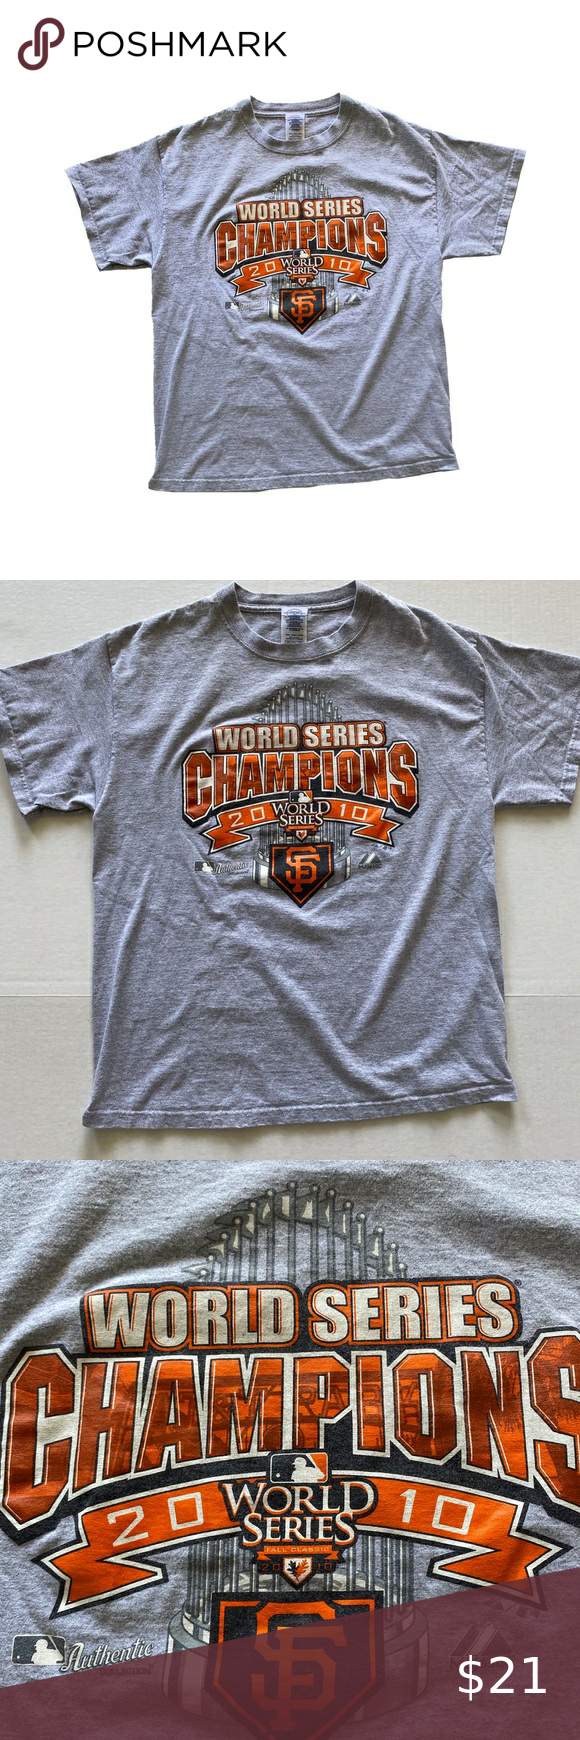 San Francisco Giants 2010 World Series T Shirt In 2020 2010 World Series San Francisco Giants World Series